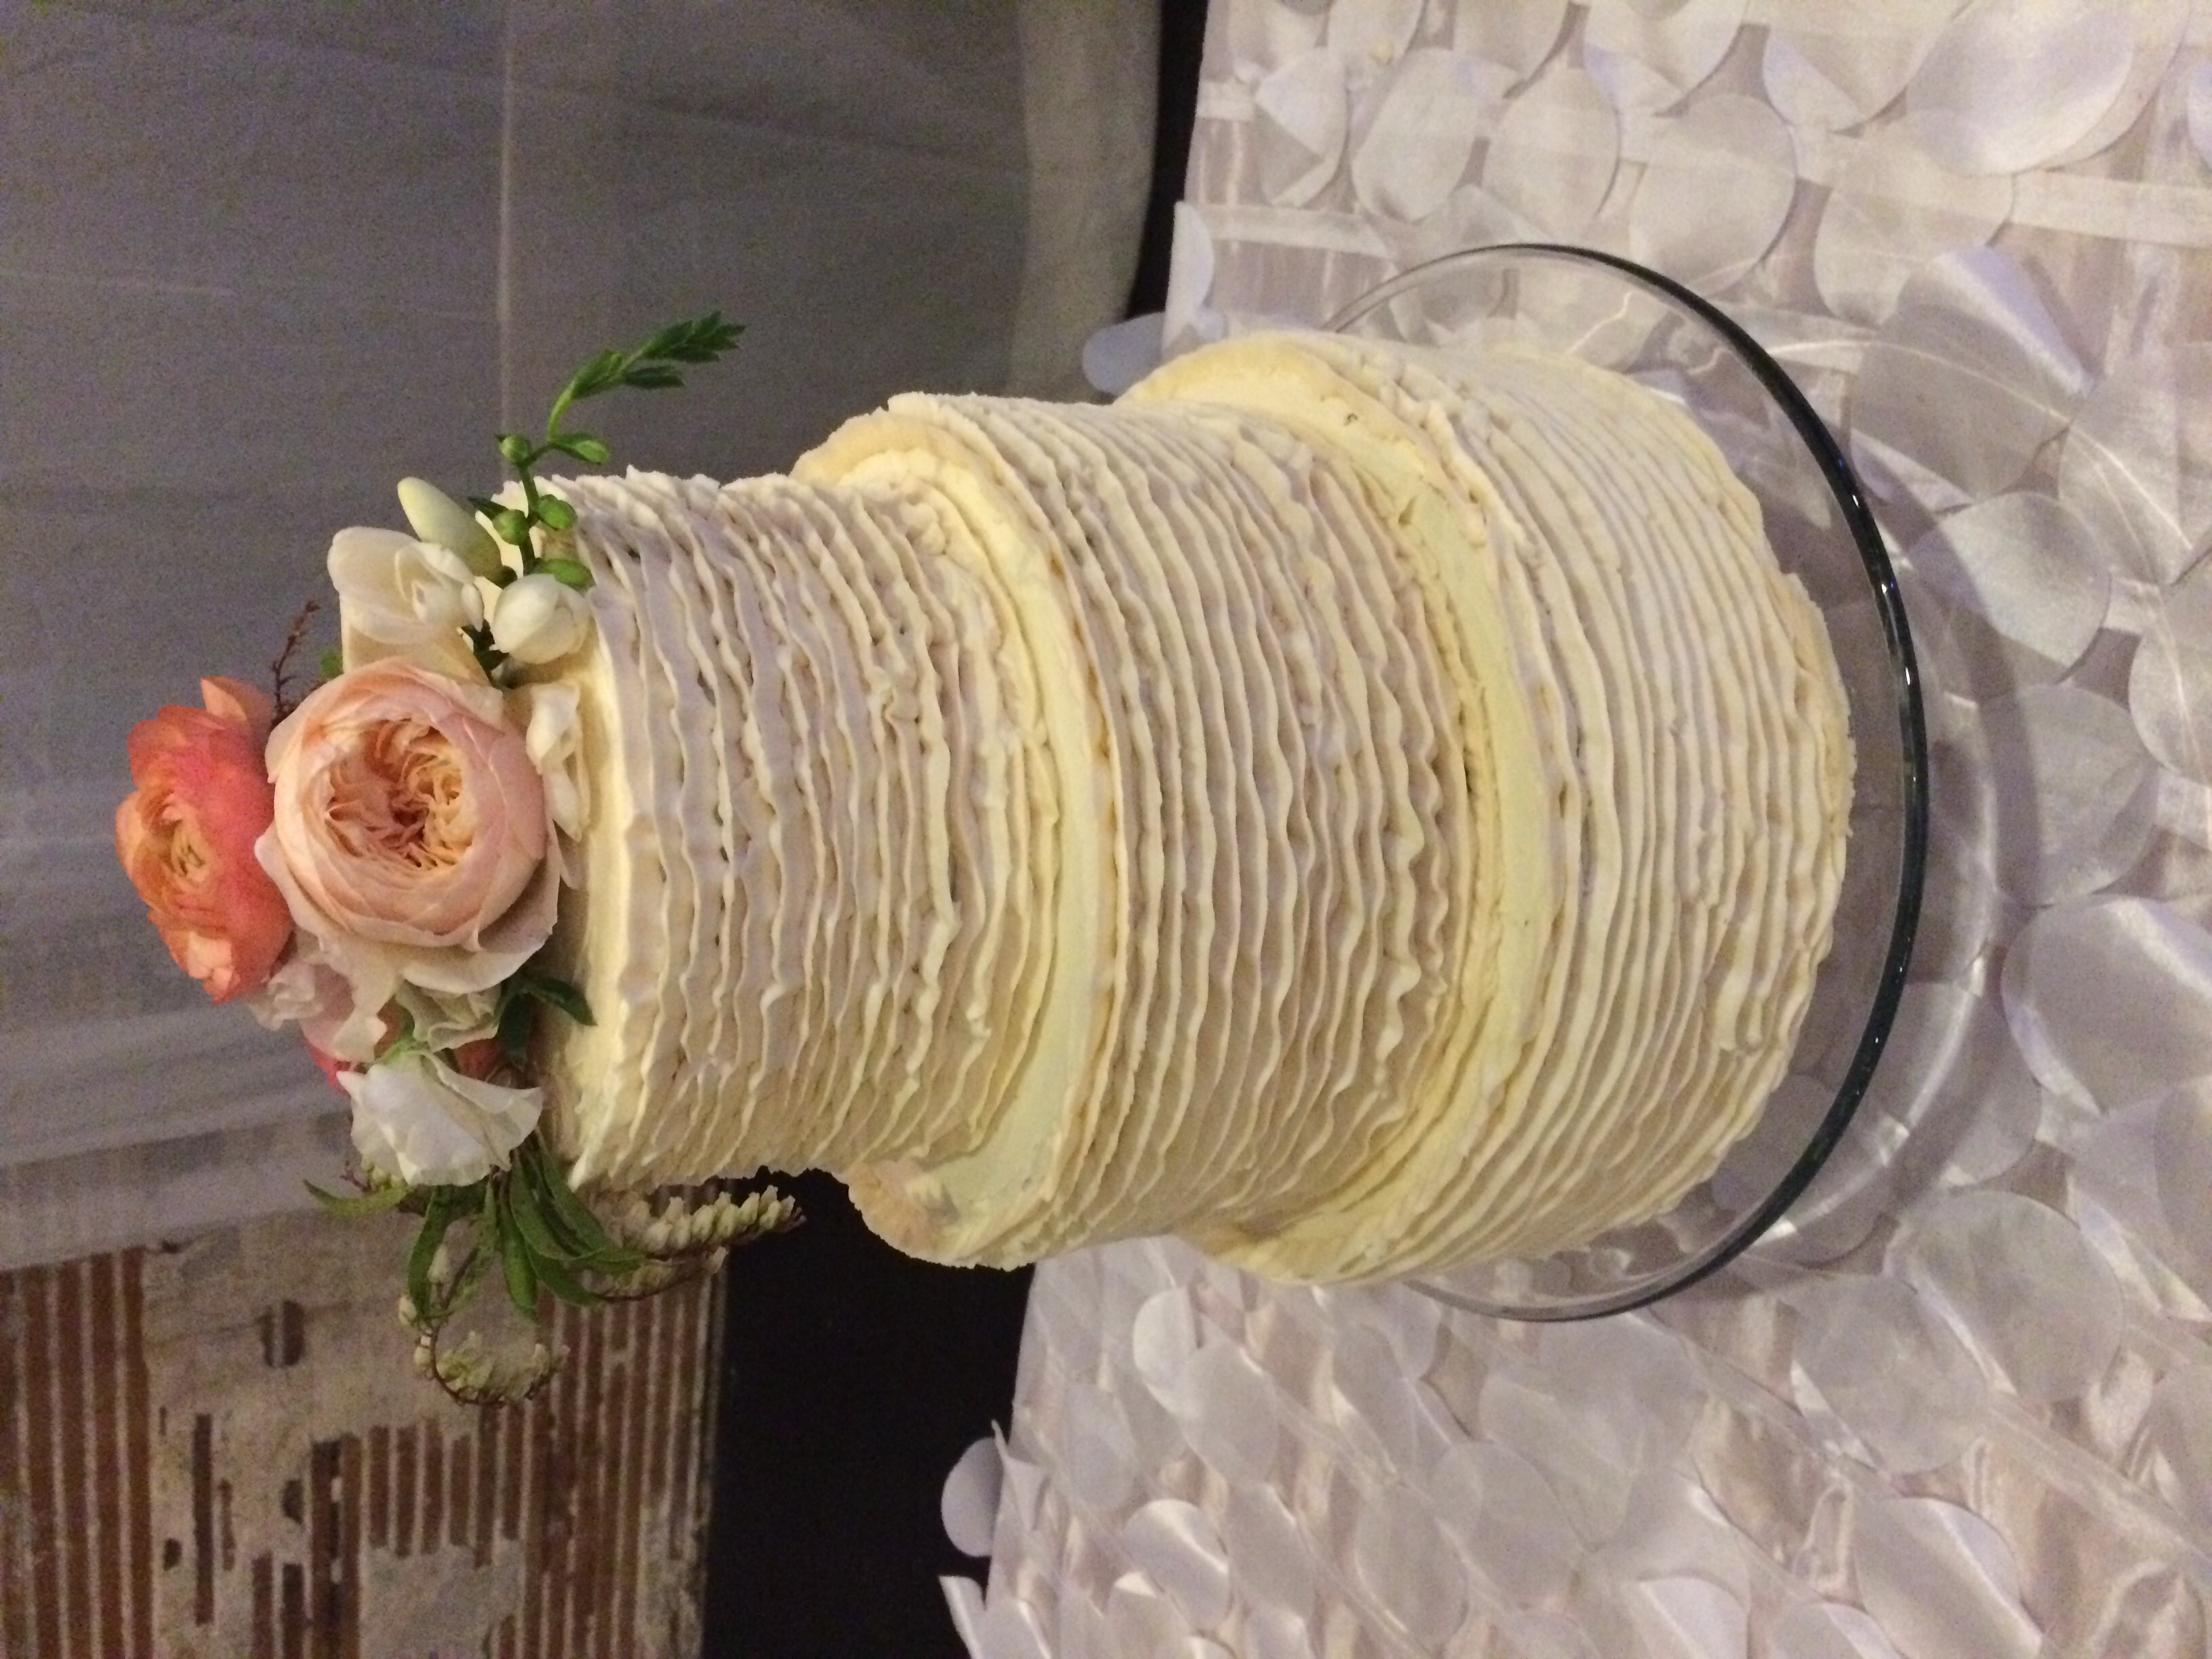 Vanilla bean wedding cake with buttercream ruffles